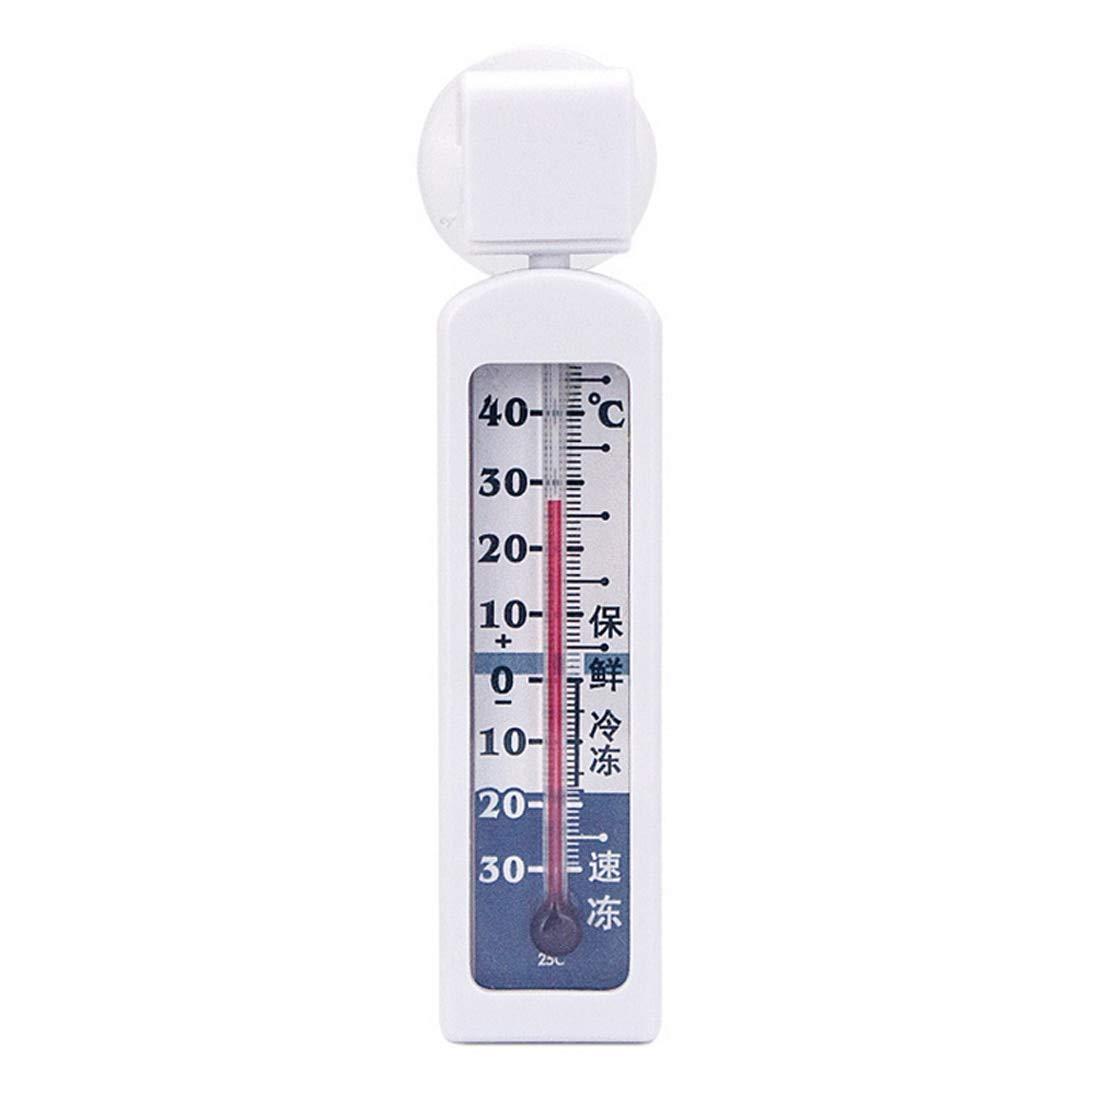 MIMI Hot 1pcs Household Home Fridge Freezer Refrigerator Refrigeration Thermometer Popular